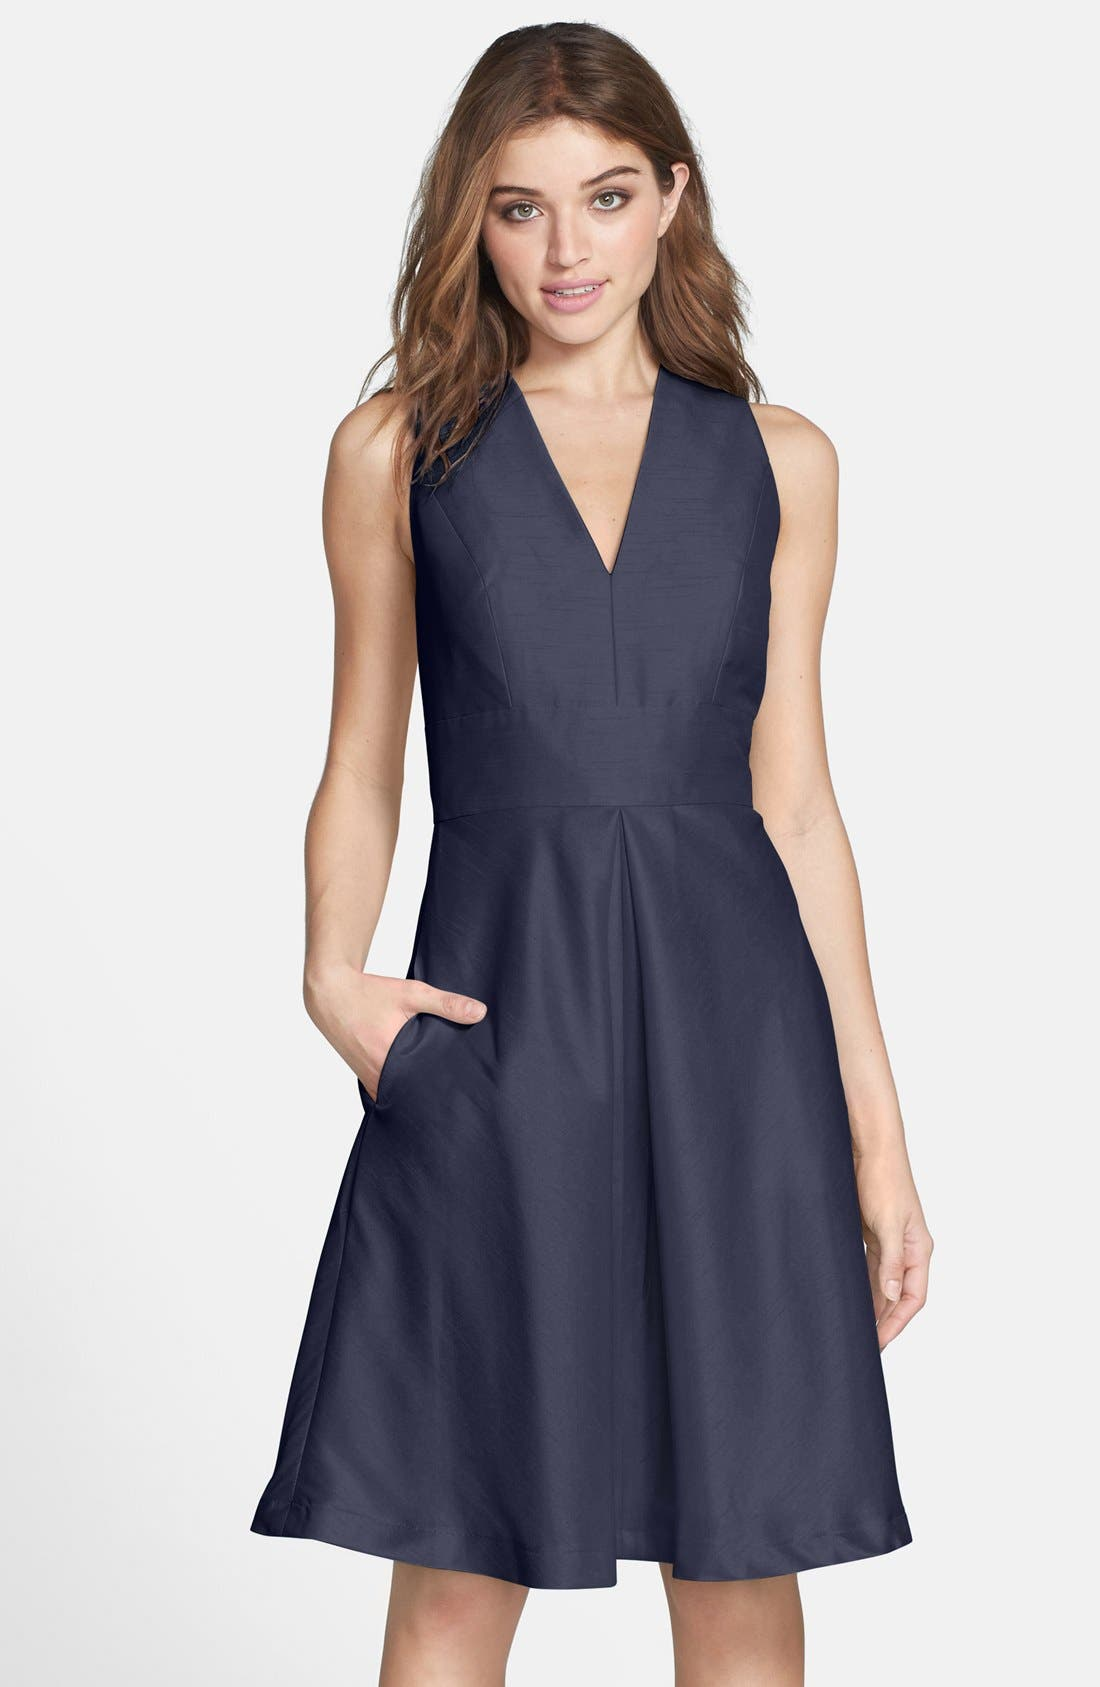 V neck cocktail dress #6031 1